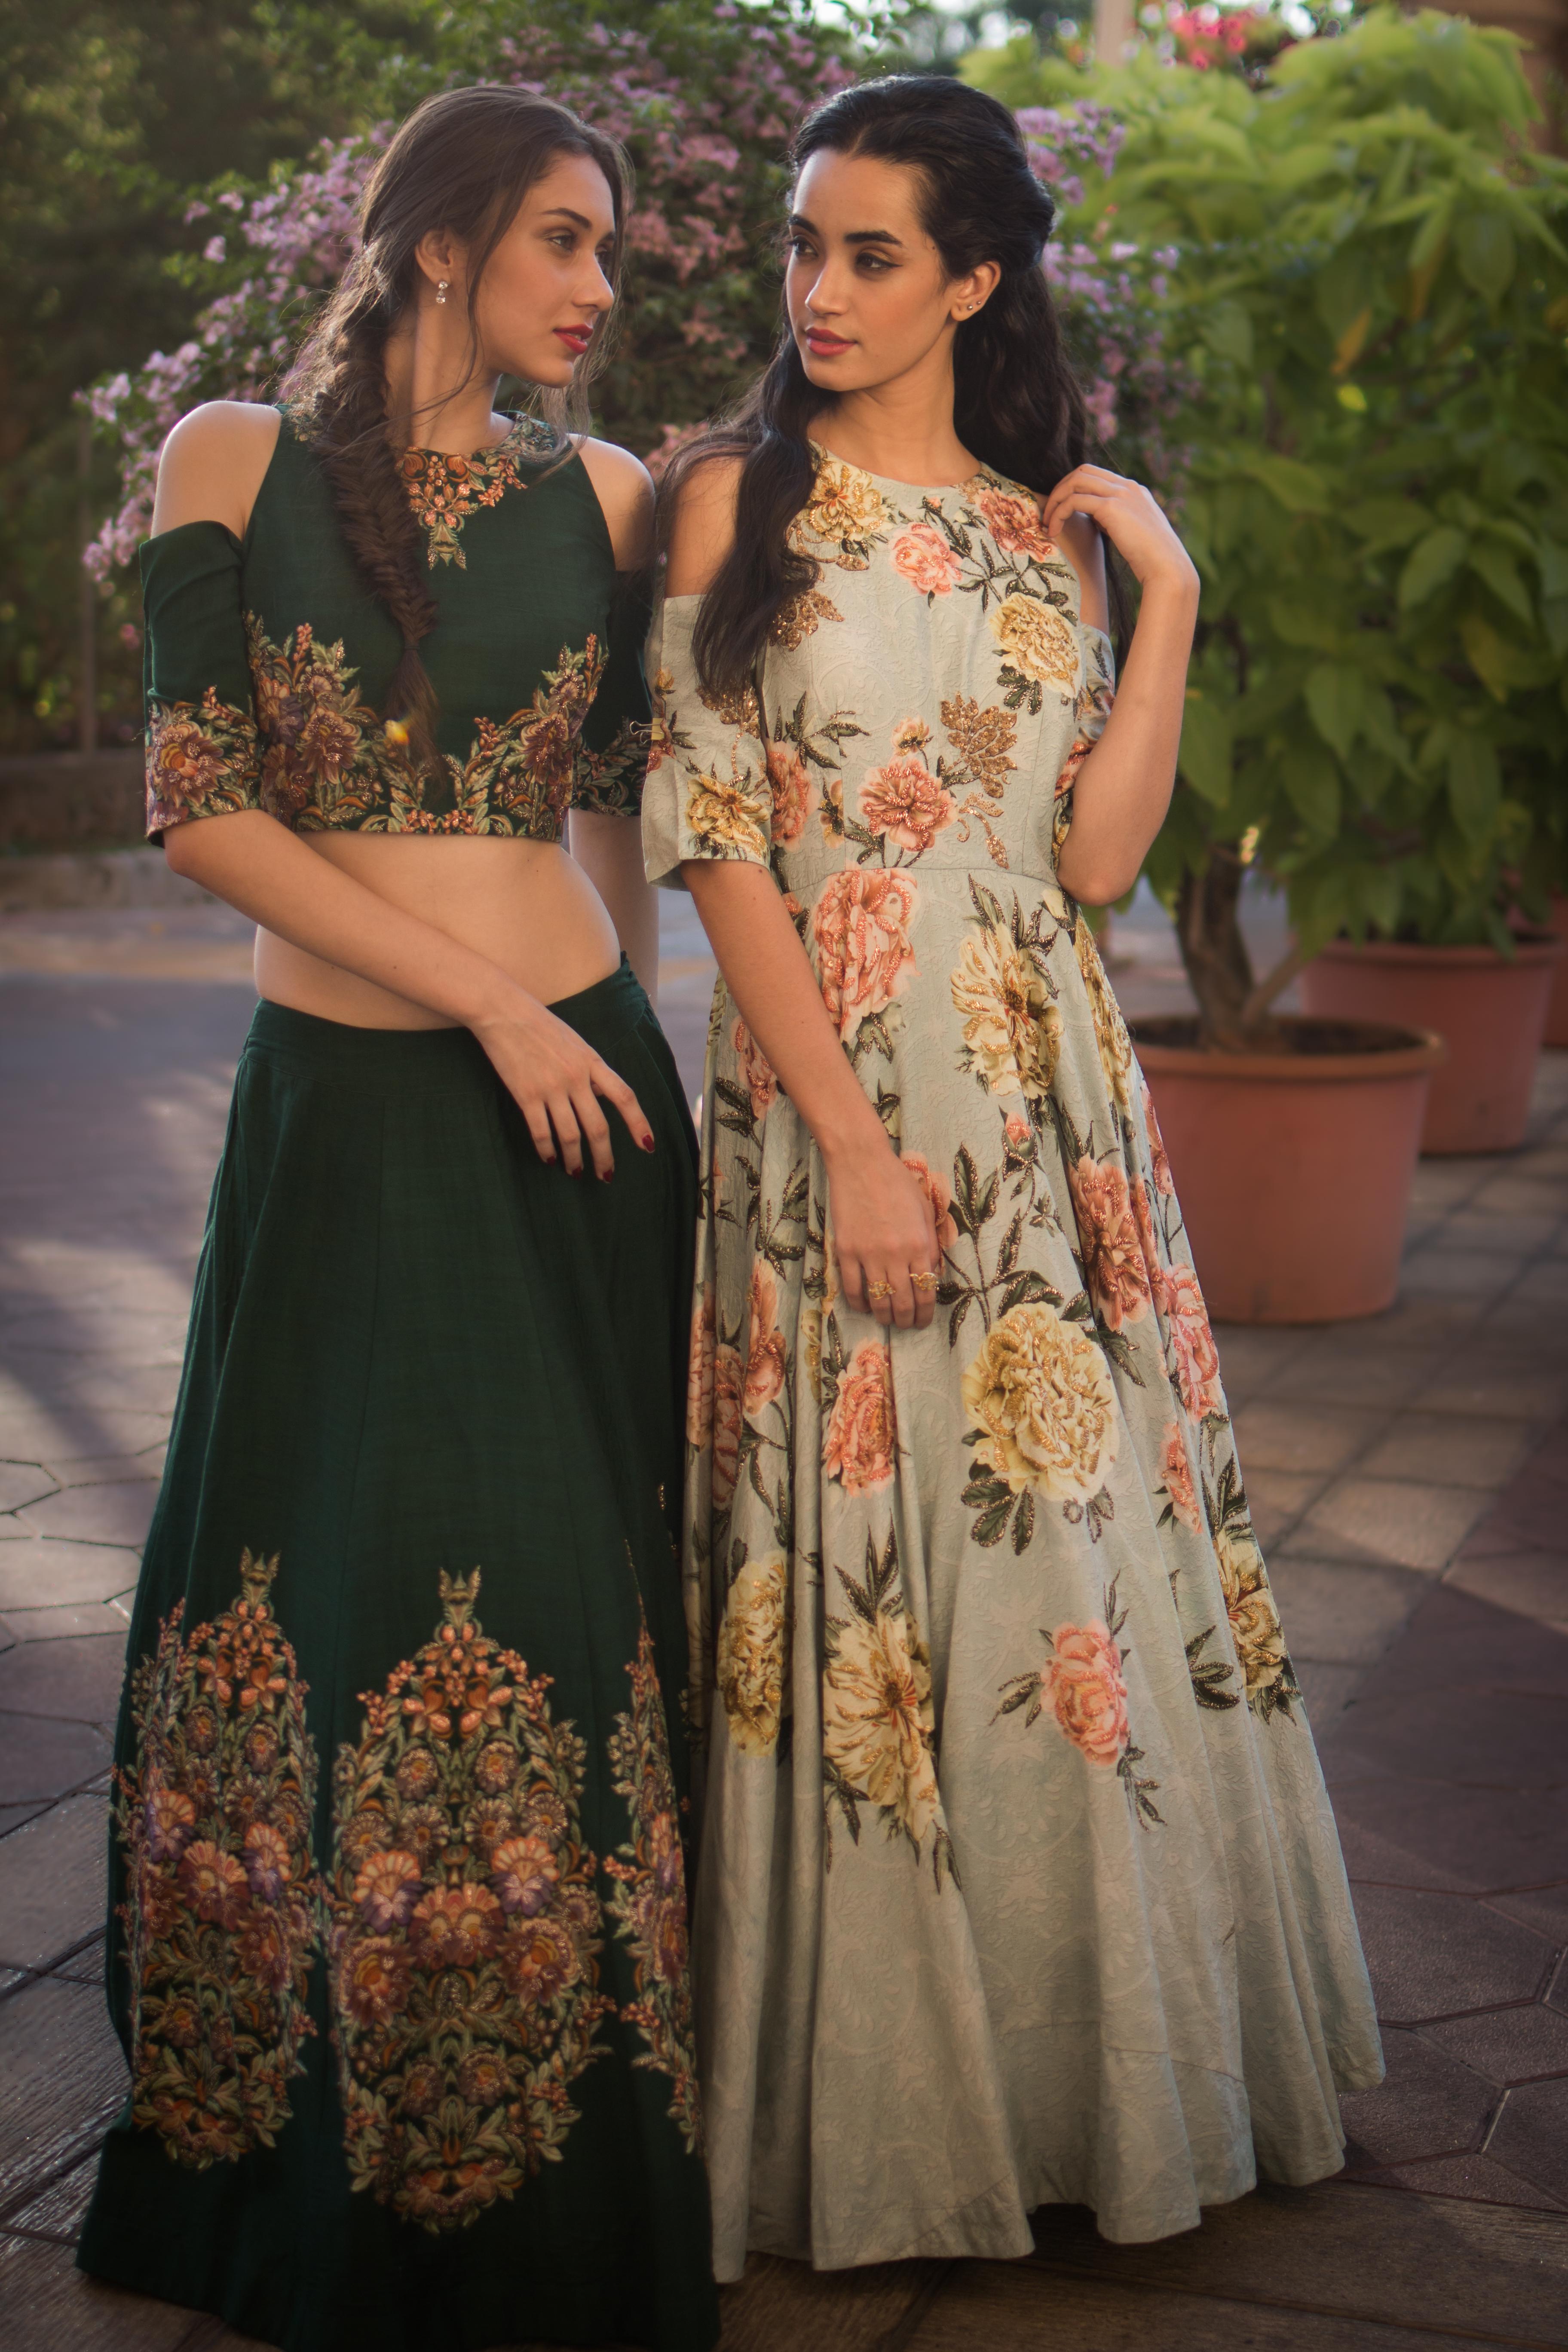 fashion rental site, rent dresses online, dresses on rent